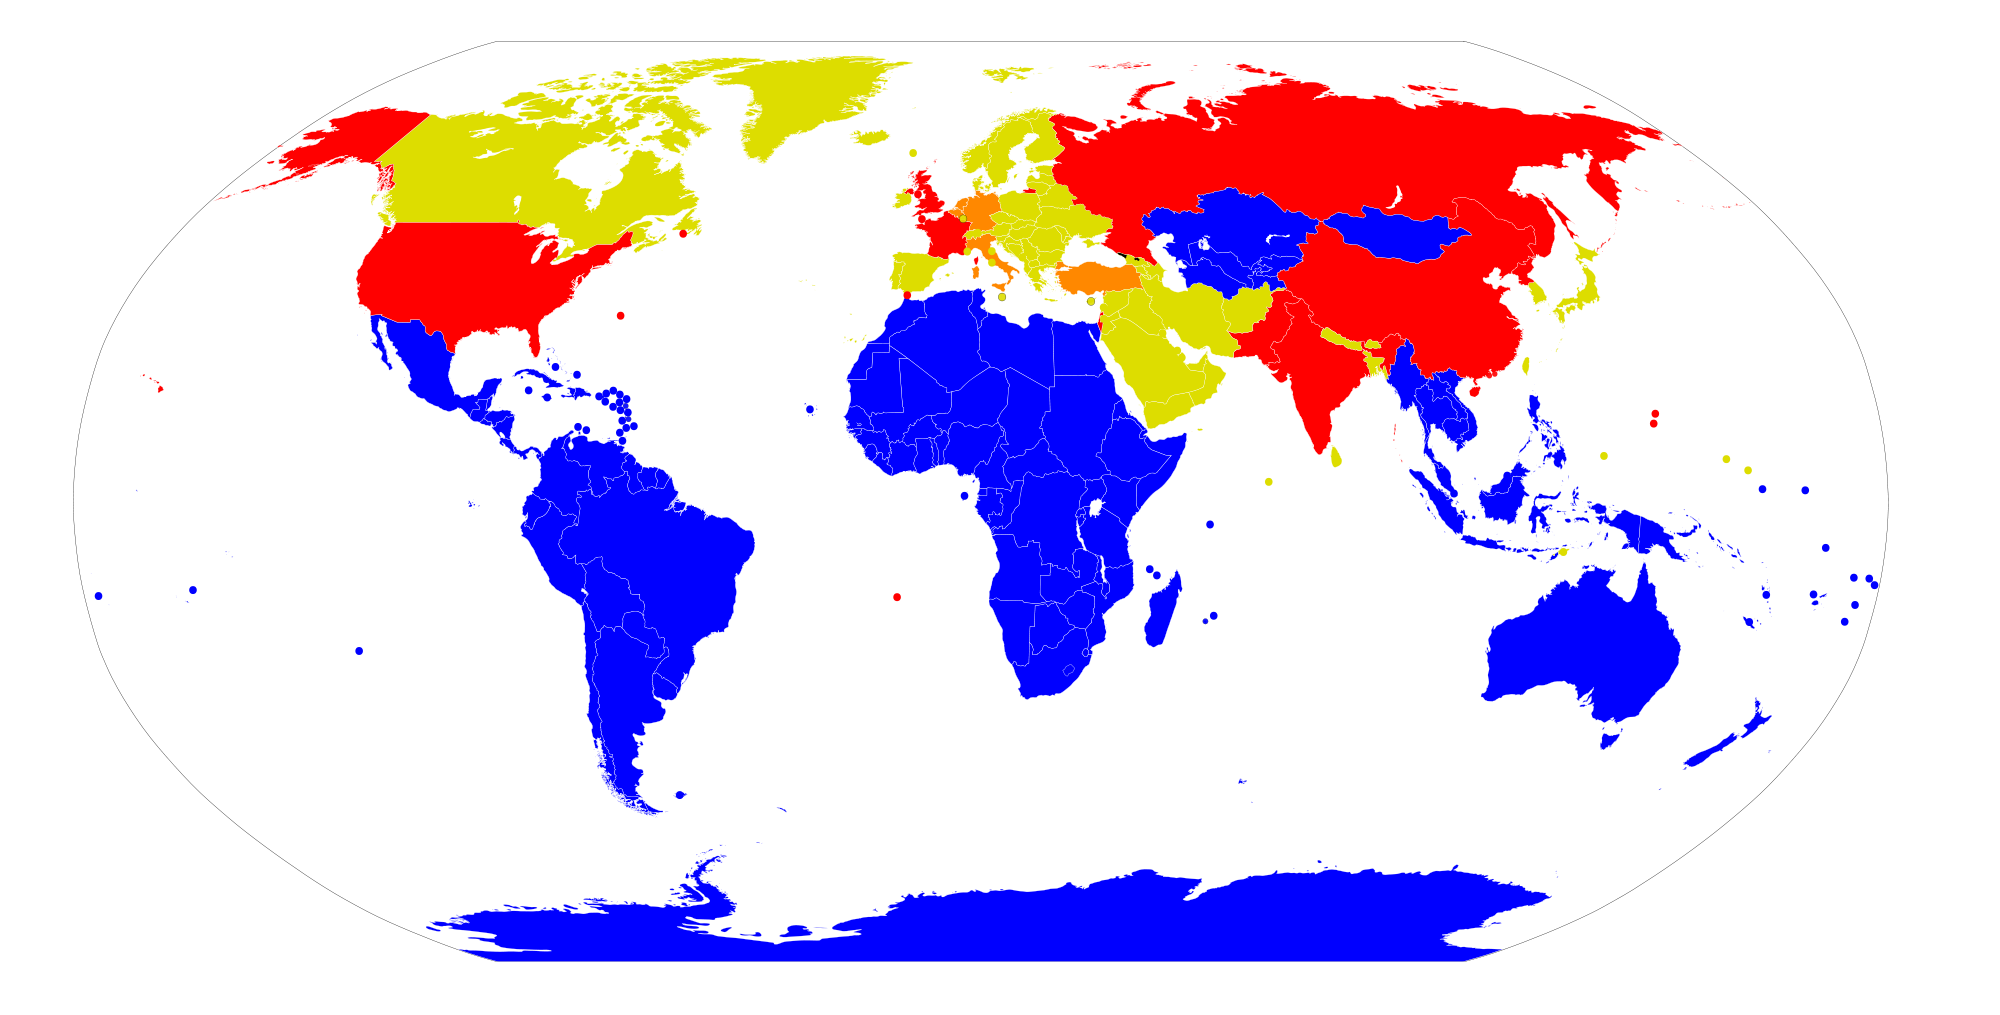 Geog fundamentals of regional. Geography clipart world geography